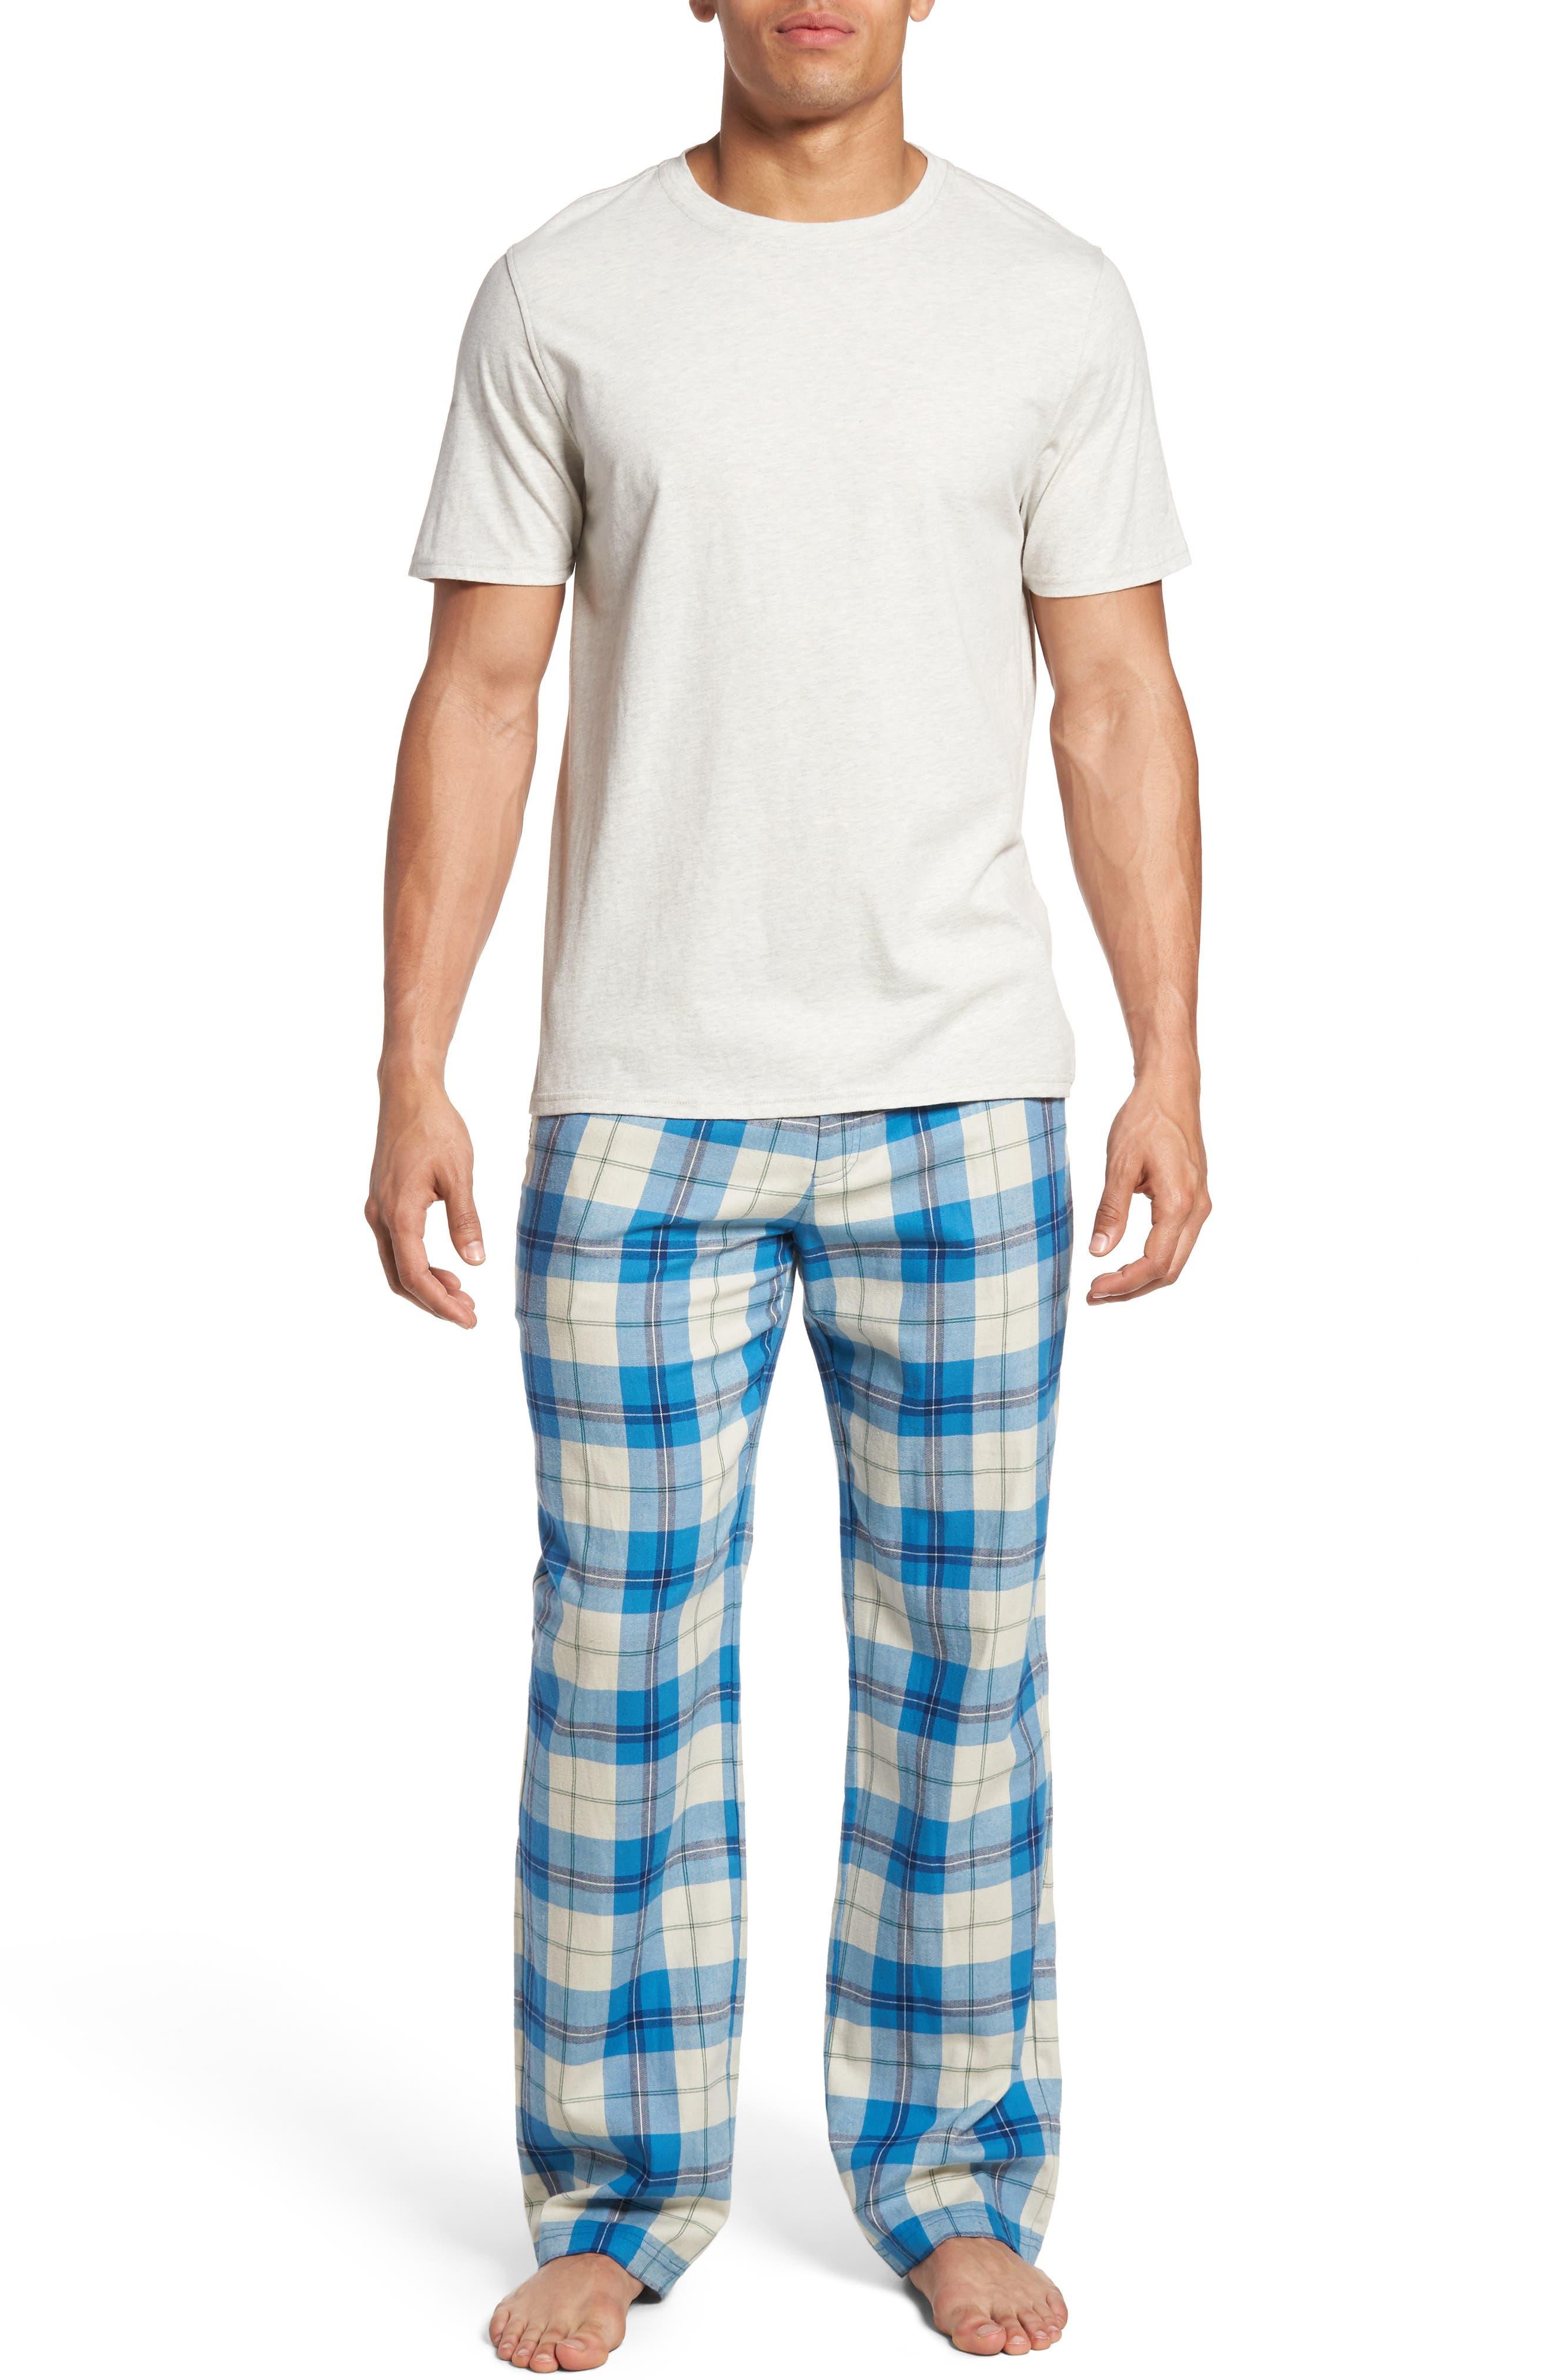 UGG® Grant Cotton Pajama Set